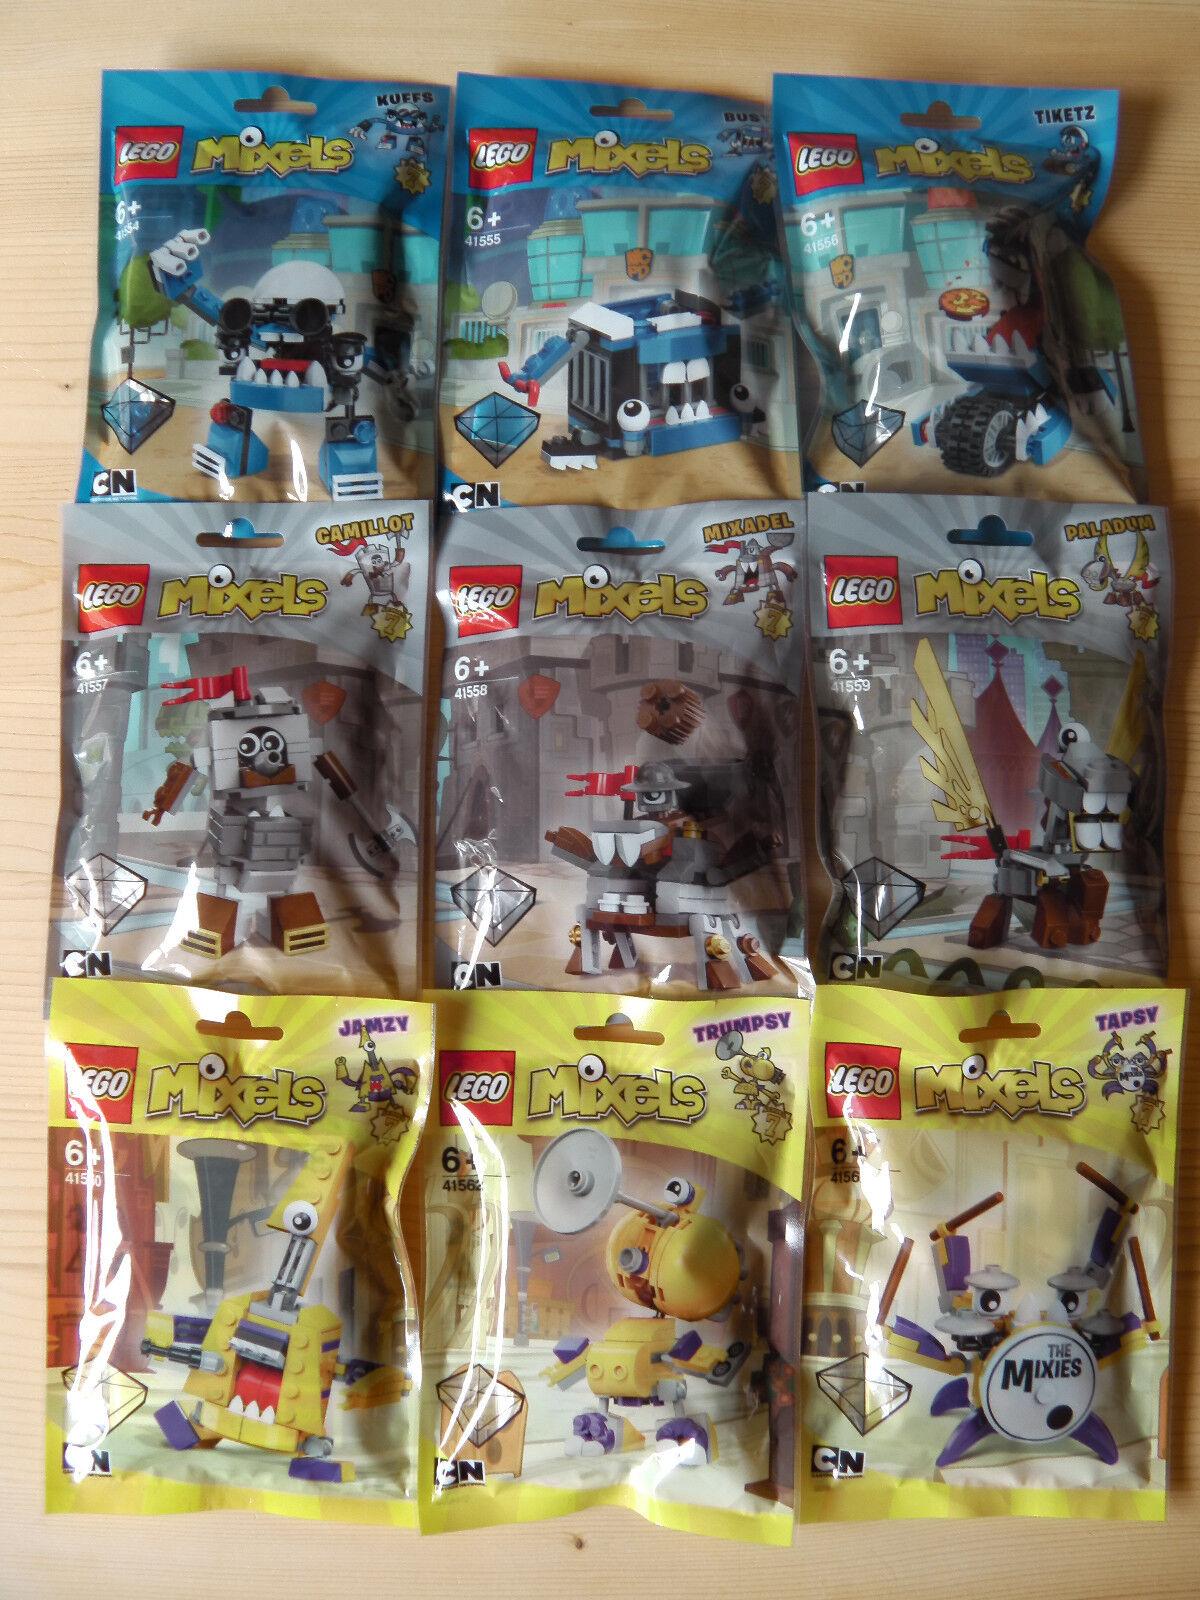 LEGO® Mixels Serie 7 komplett (41554 - 41562) 9 Stück inkl. Versand Neu & Ovp